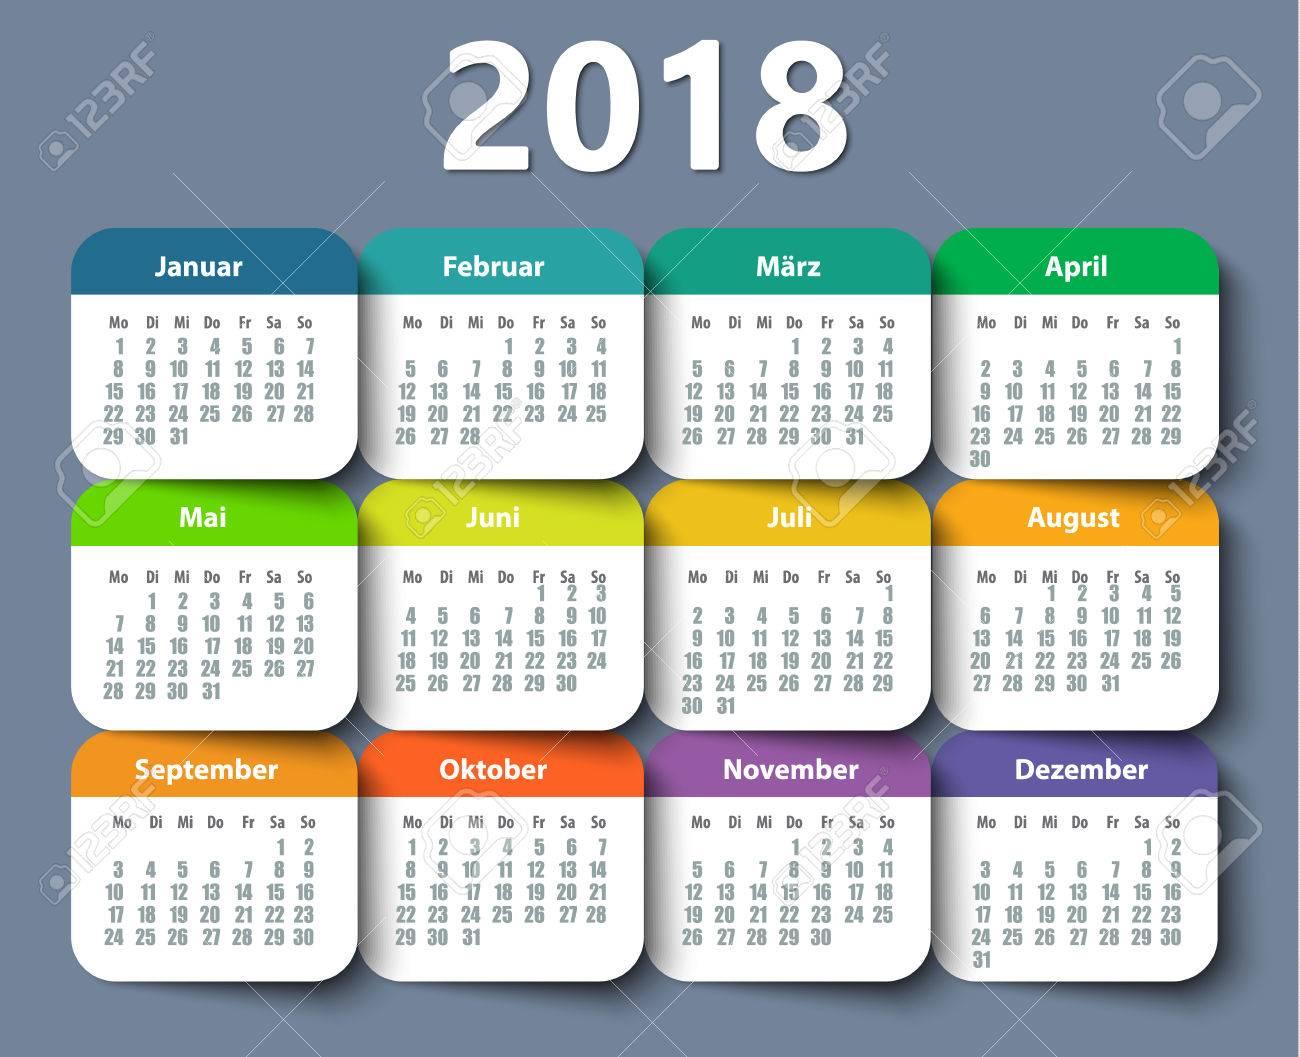 calendar 2018 year german week starting on monday stock vector 85349828